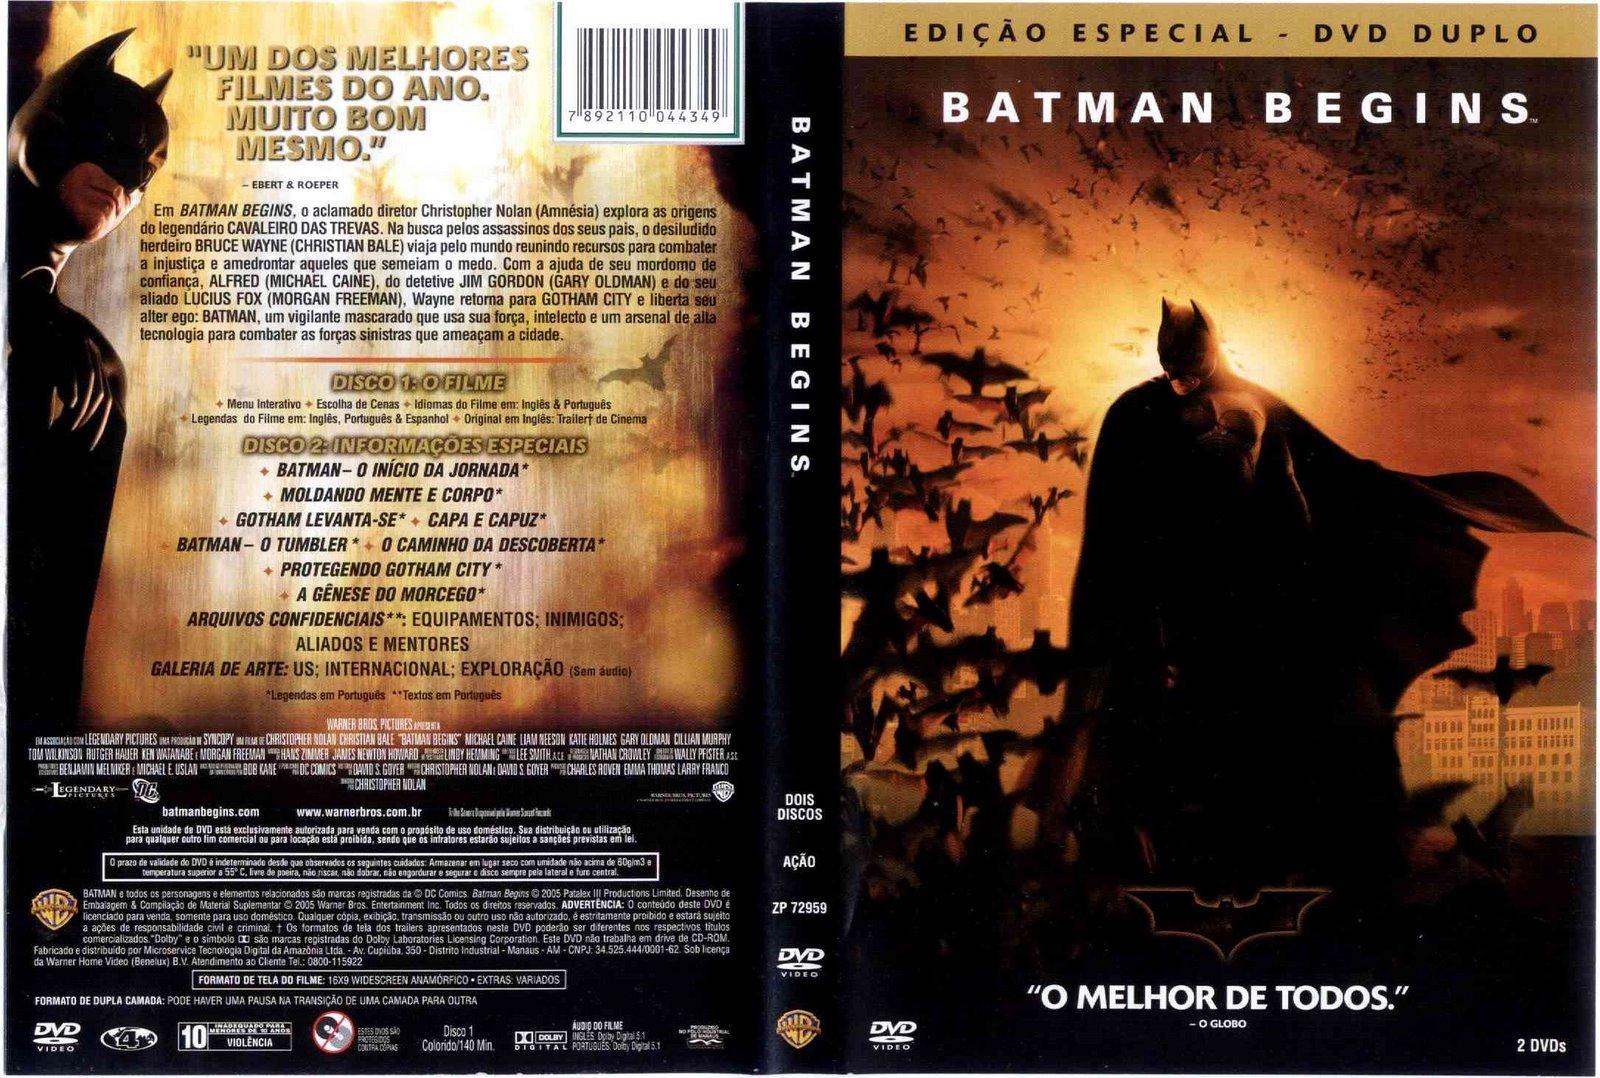 http://2.bp.blogspot.com/_Tgeb_LTYc0o/S8MAXkxWV6I/AAAAAAAAAT0/jRZxWf5wjeA/s1600/batman+beggins.jpg